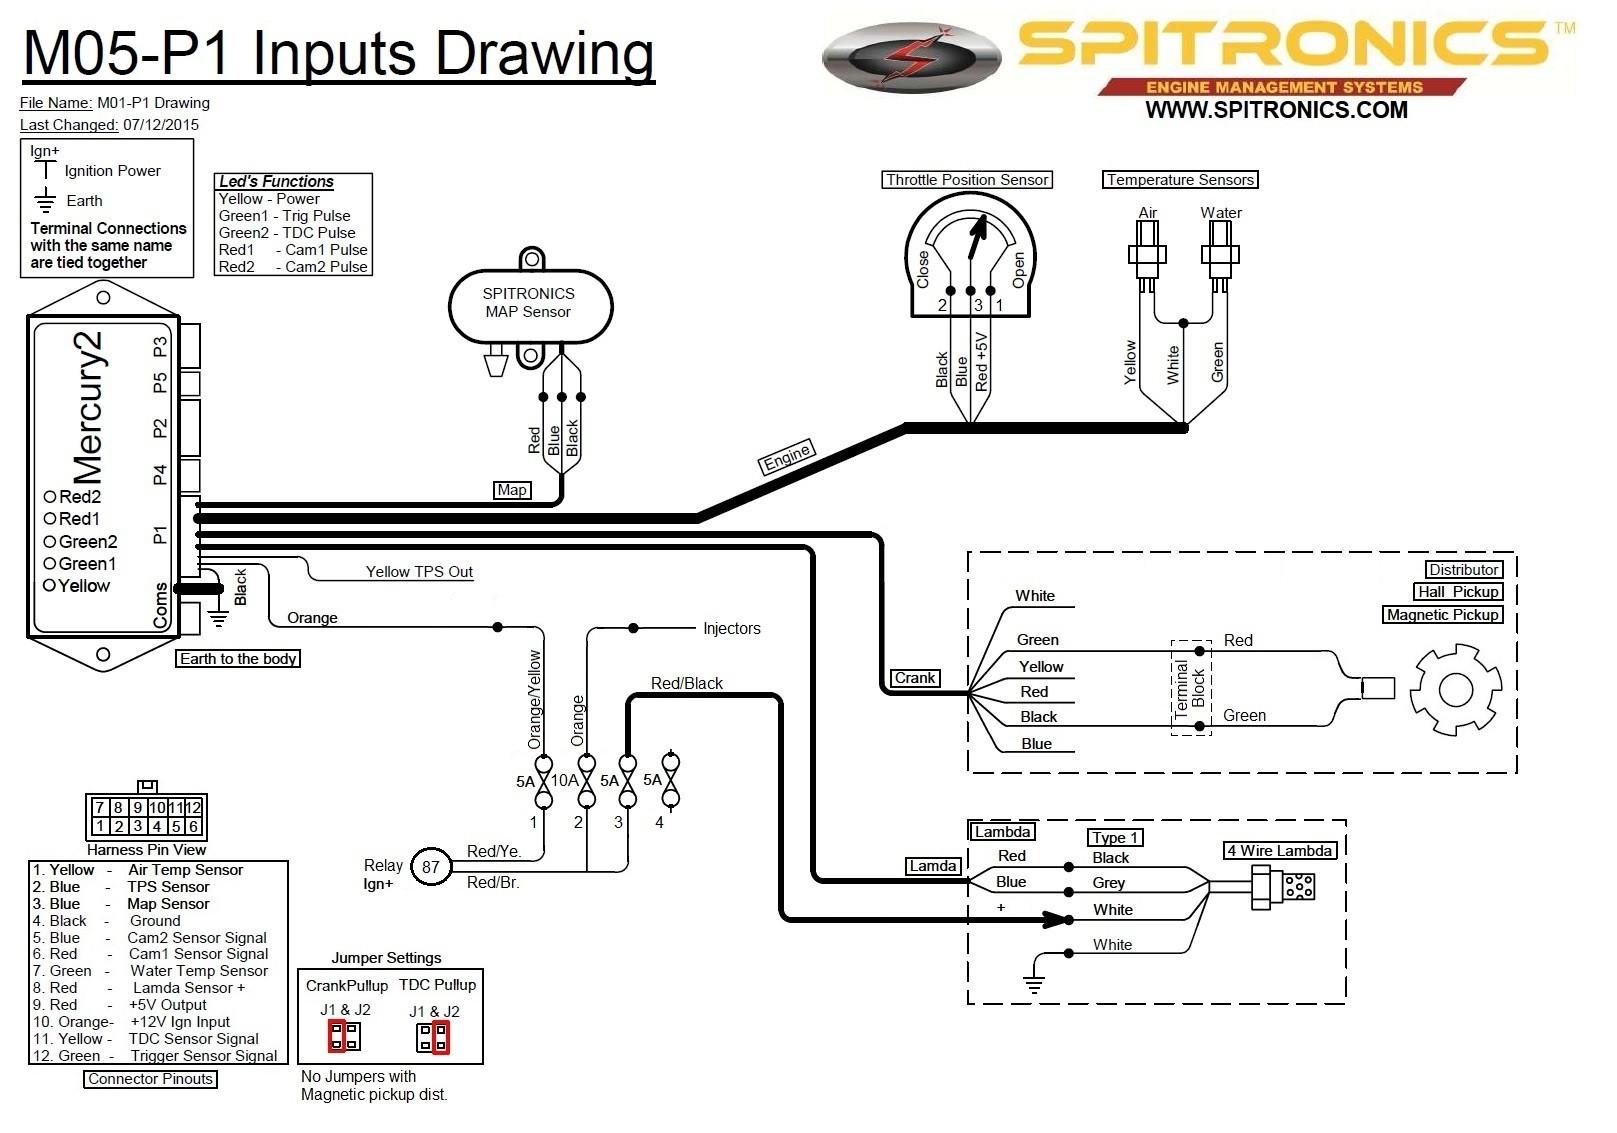 Spitronics Pluto Wiring Diagram Upgrading A 280z Efi to Spitronics Mercury 2 Ecu Page 2 Fuel Injection the Classic Zcar Club Of Spitronics Pluto Wiring Diagram